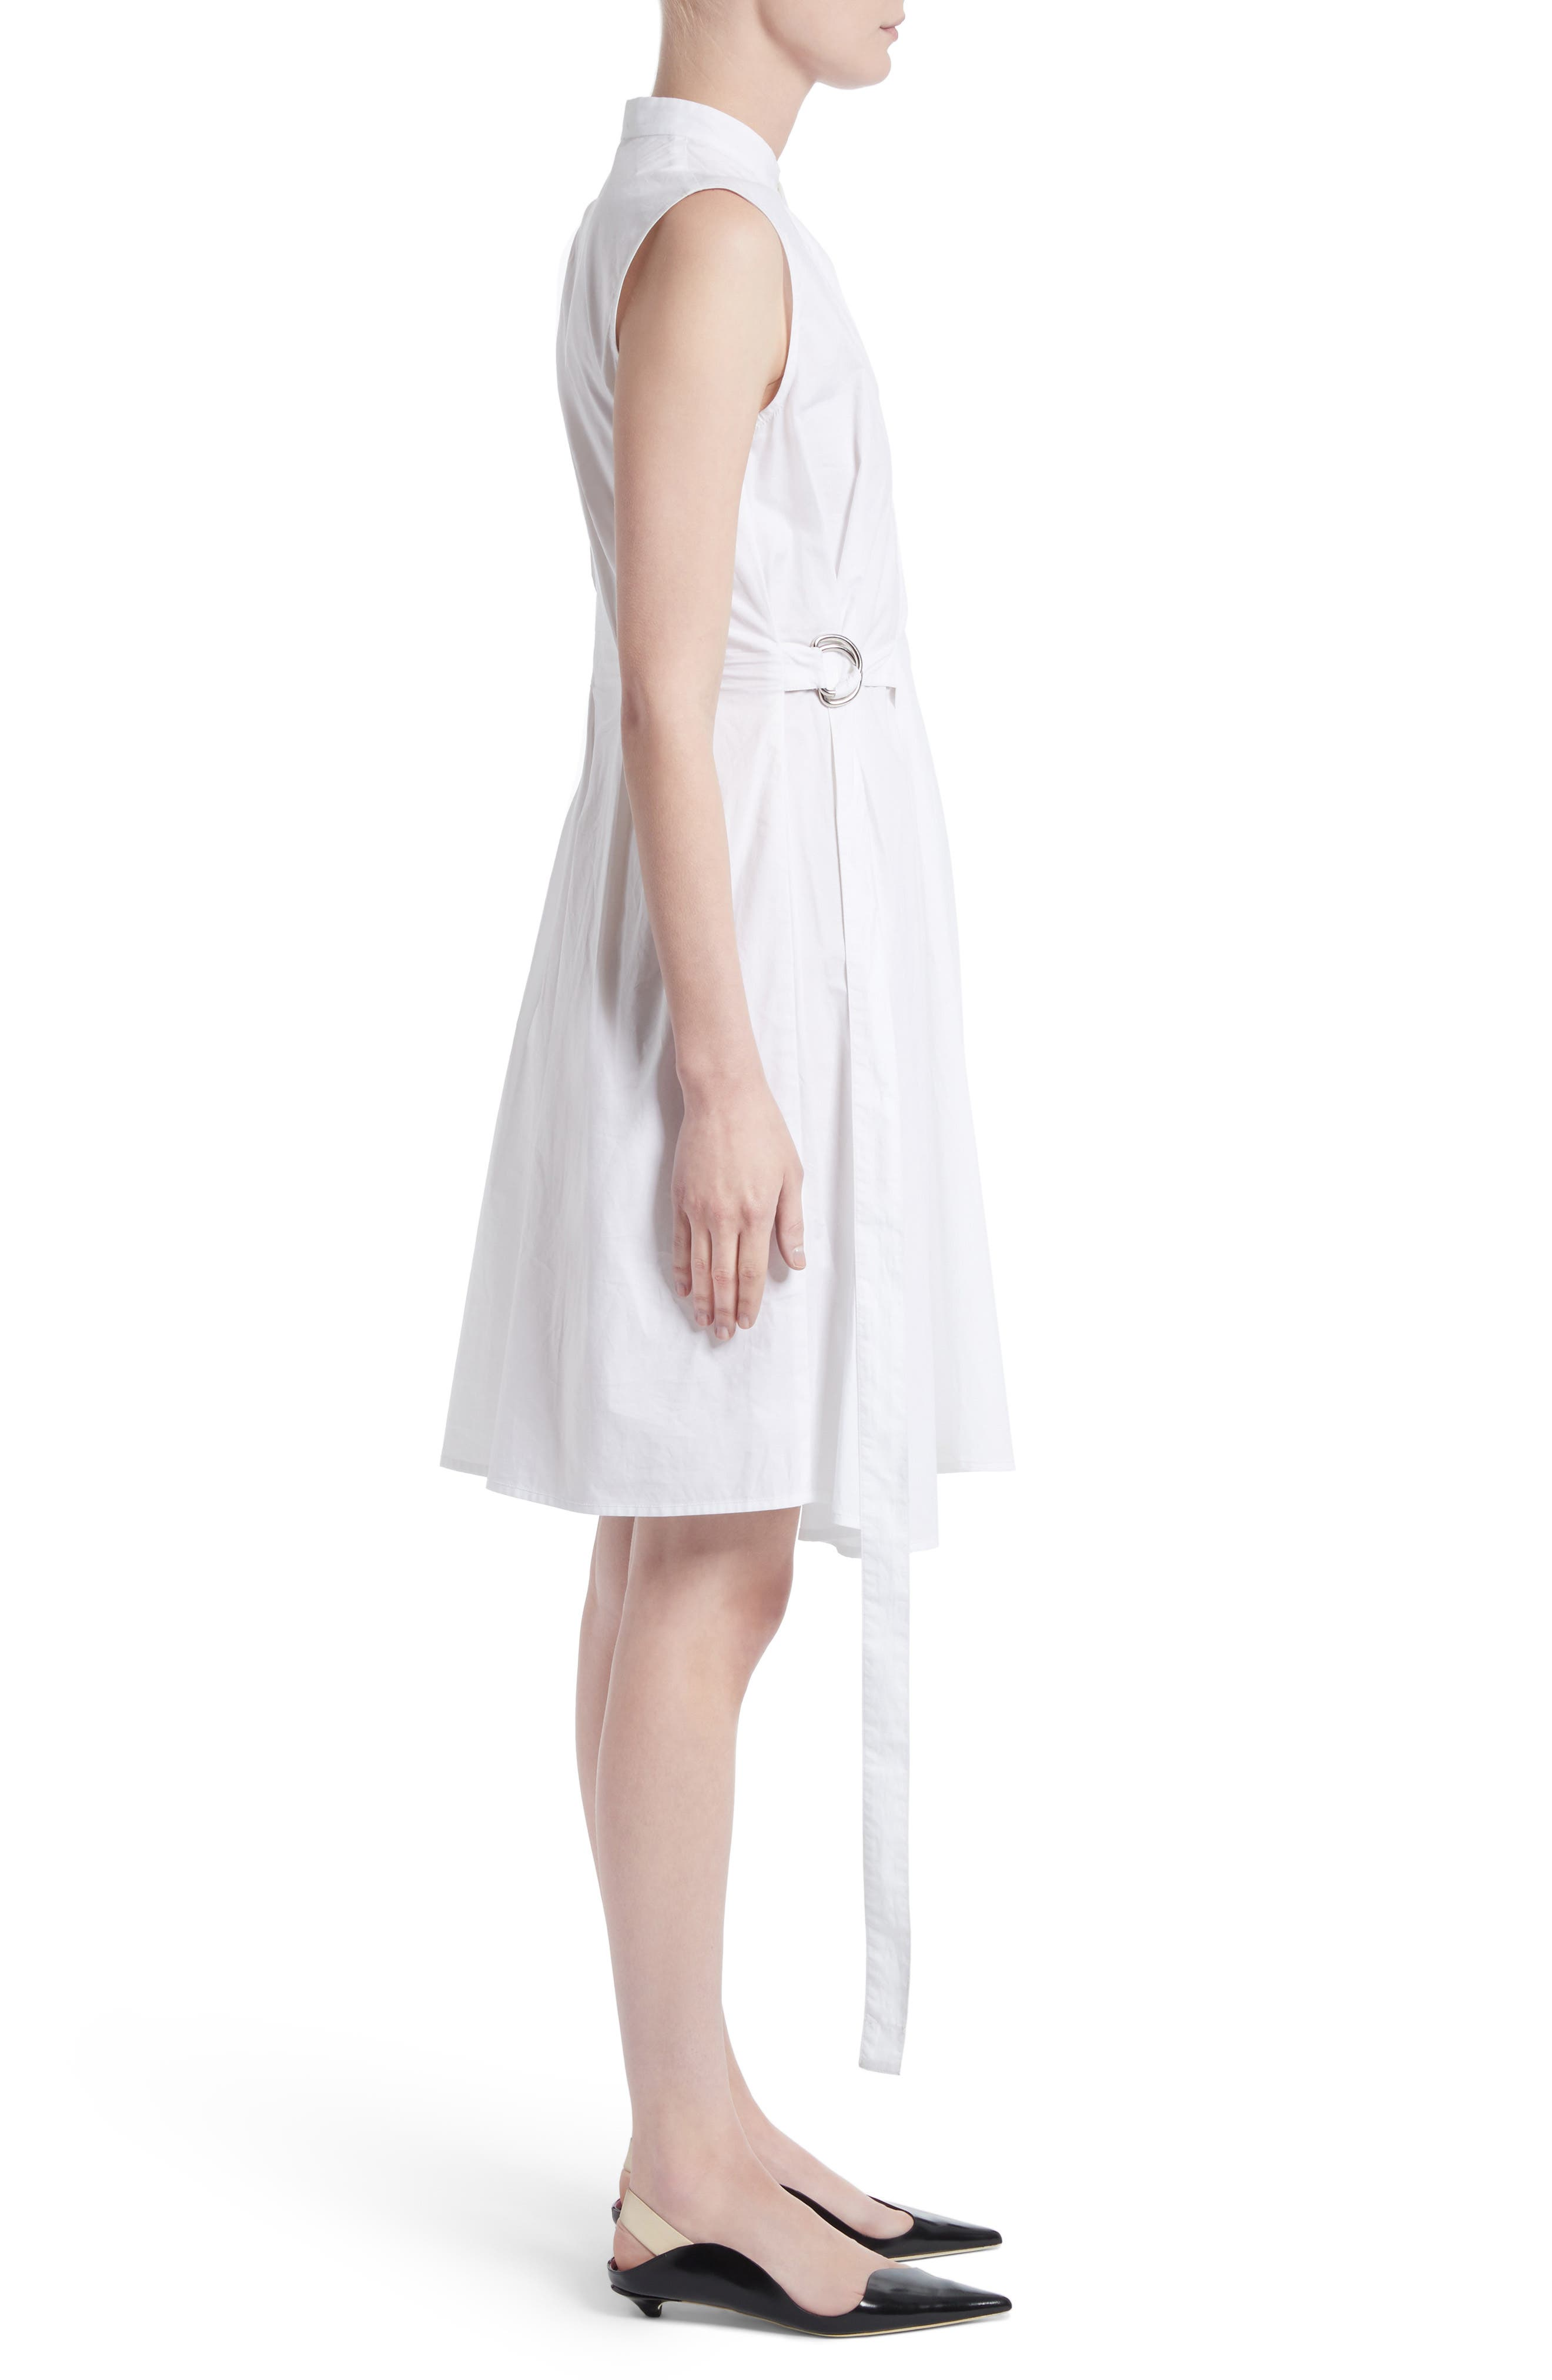 PROENZA SCHOULER,                             Cotton Poplin Wrap Dress,                             Alternate thumbnail 3, color,                             100